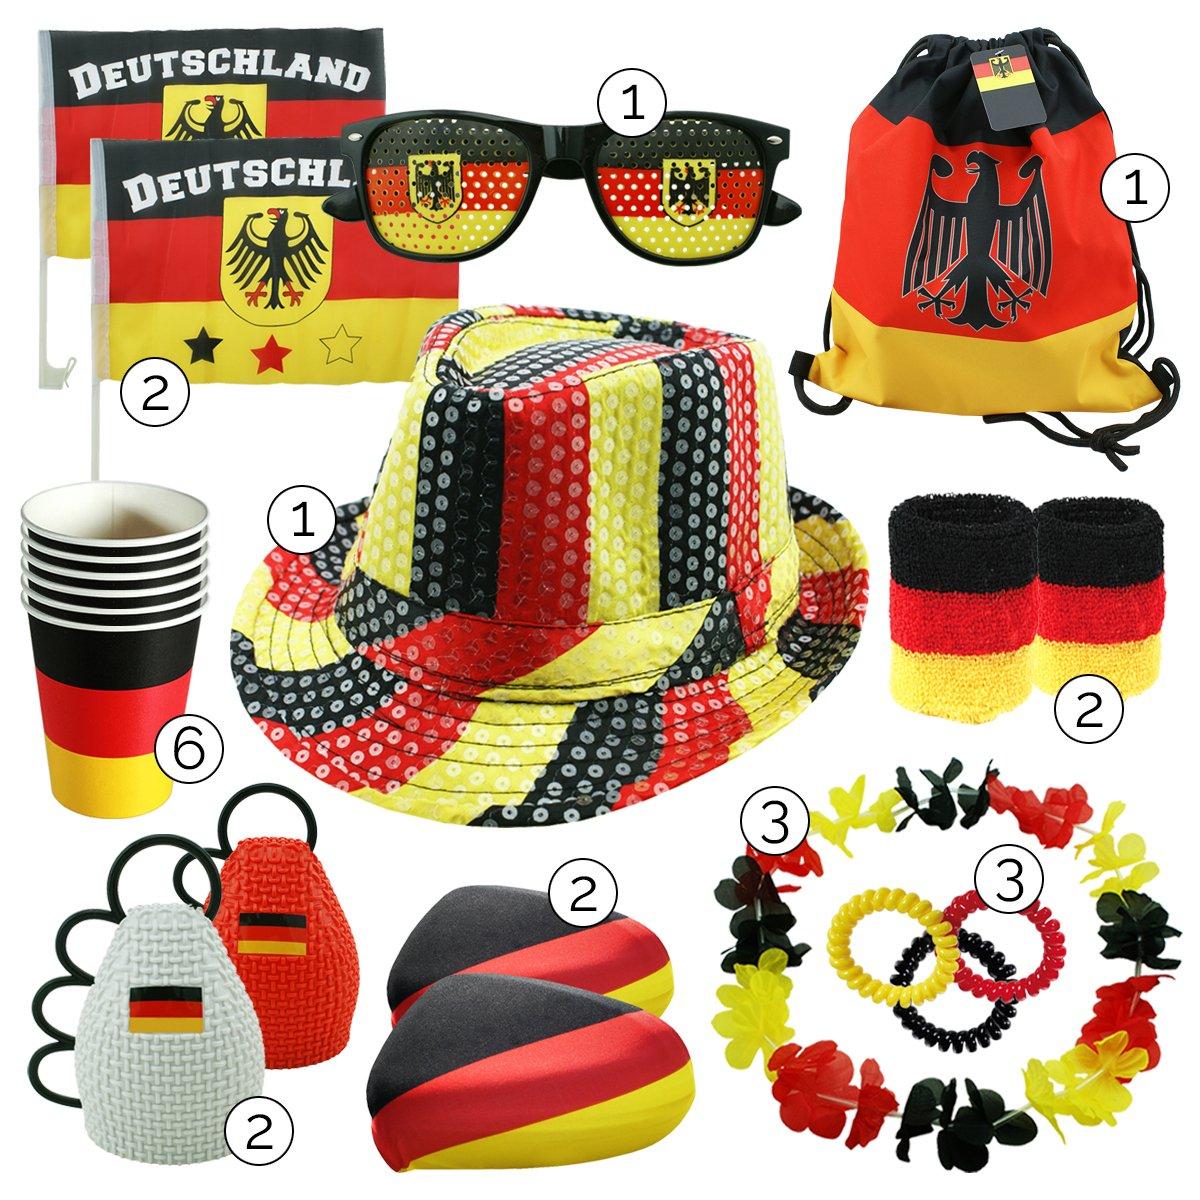 int!rend Fanartikel Deutschland WM Set, 23 Stück, Fanset zur Fußball Weltmeisterschaft 2018 in Russland, Fussball Fan Artikel